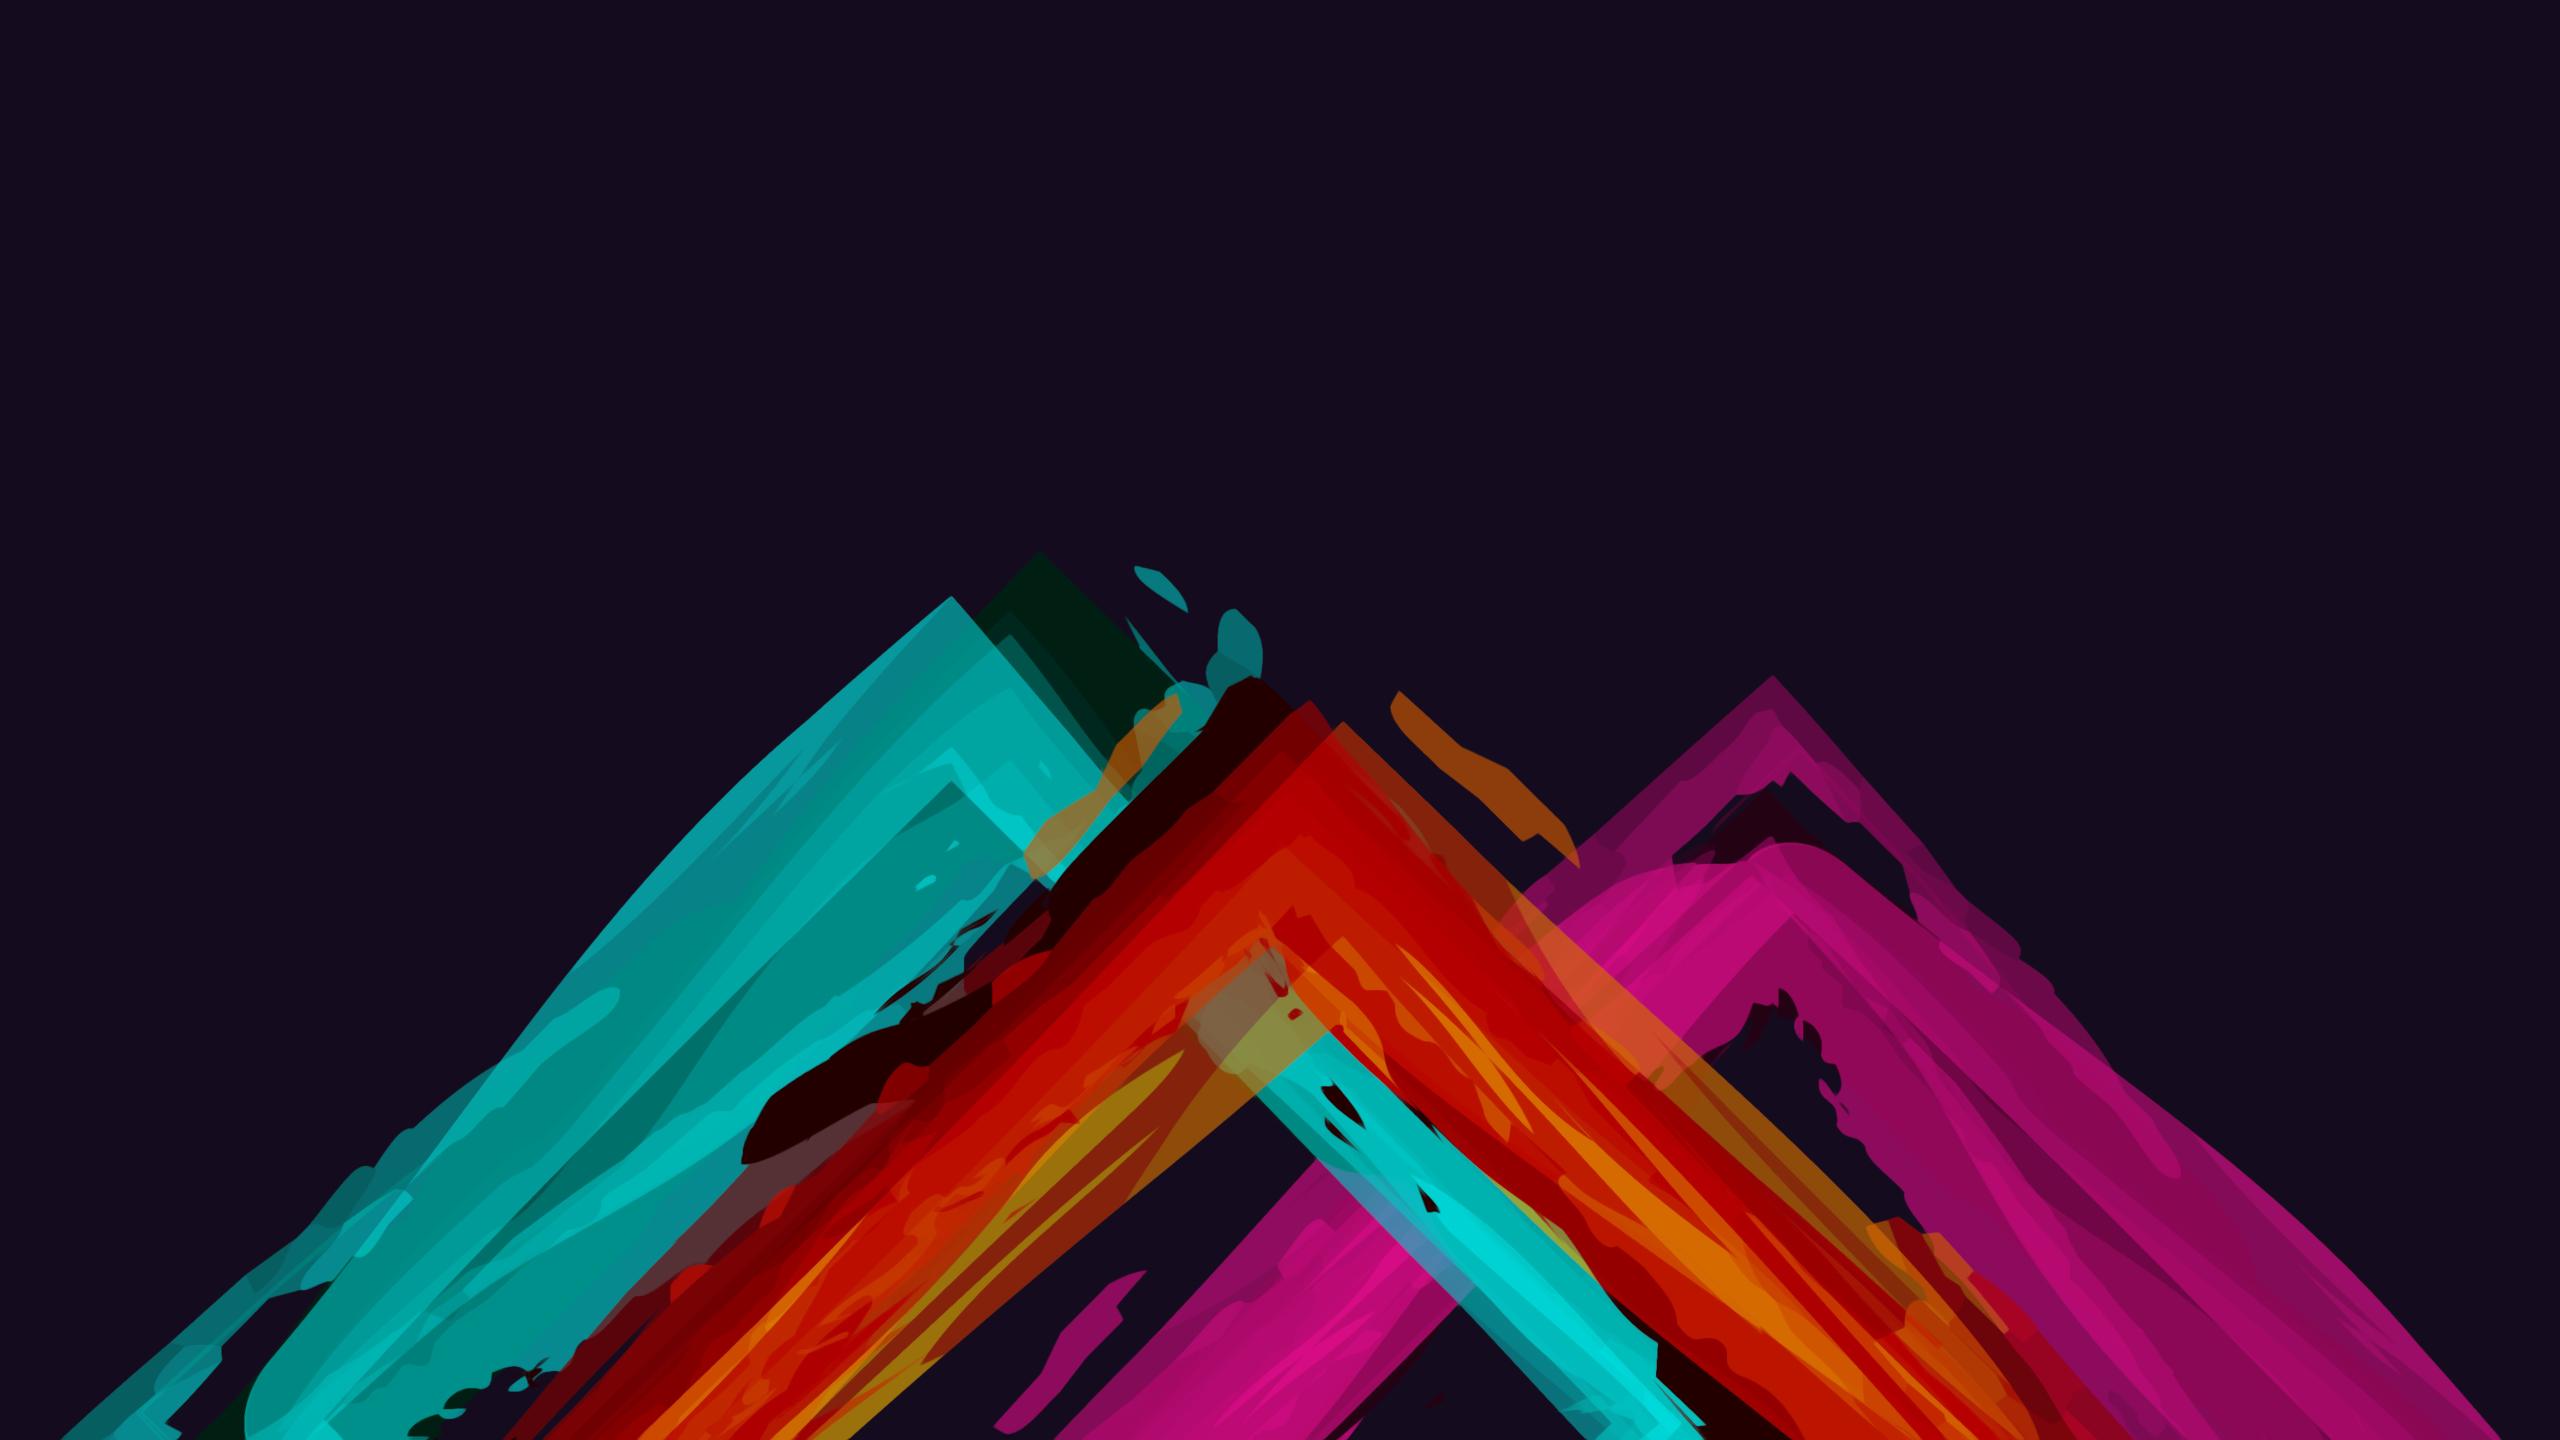 trianglesvivid.jpg